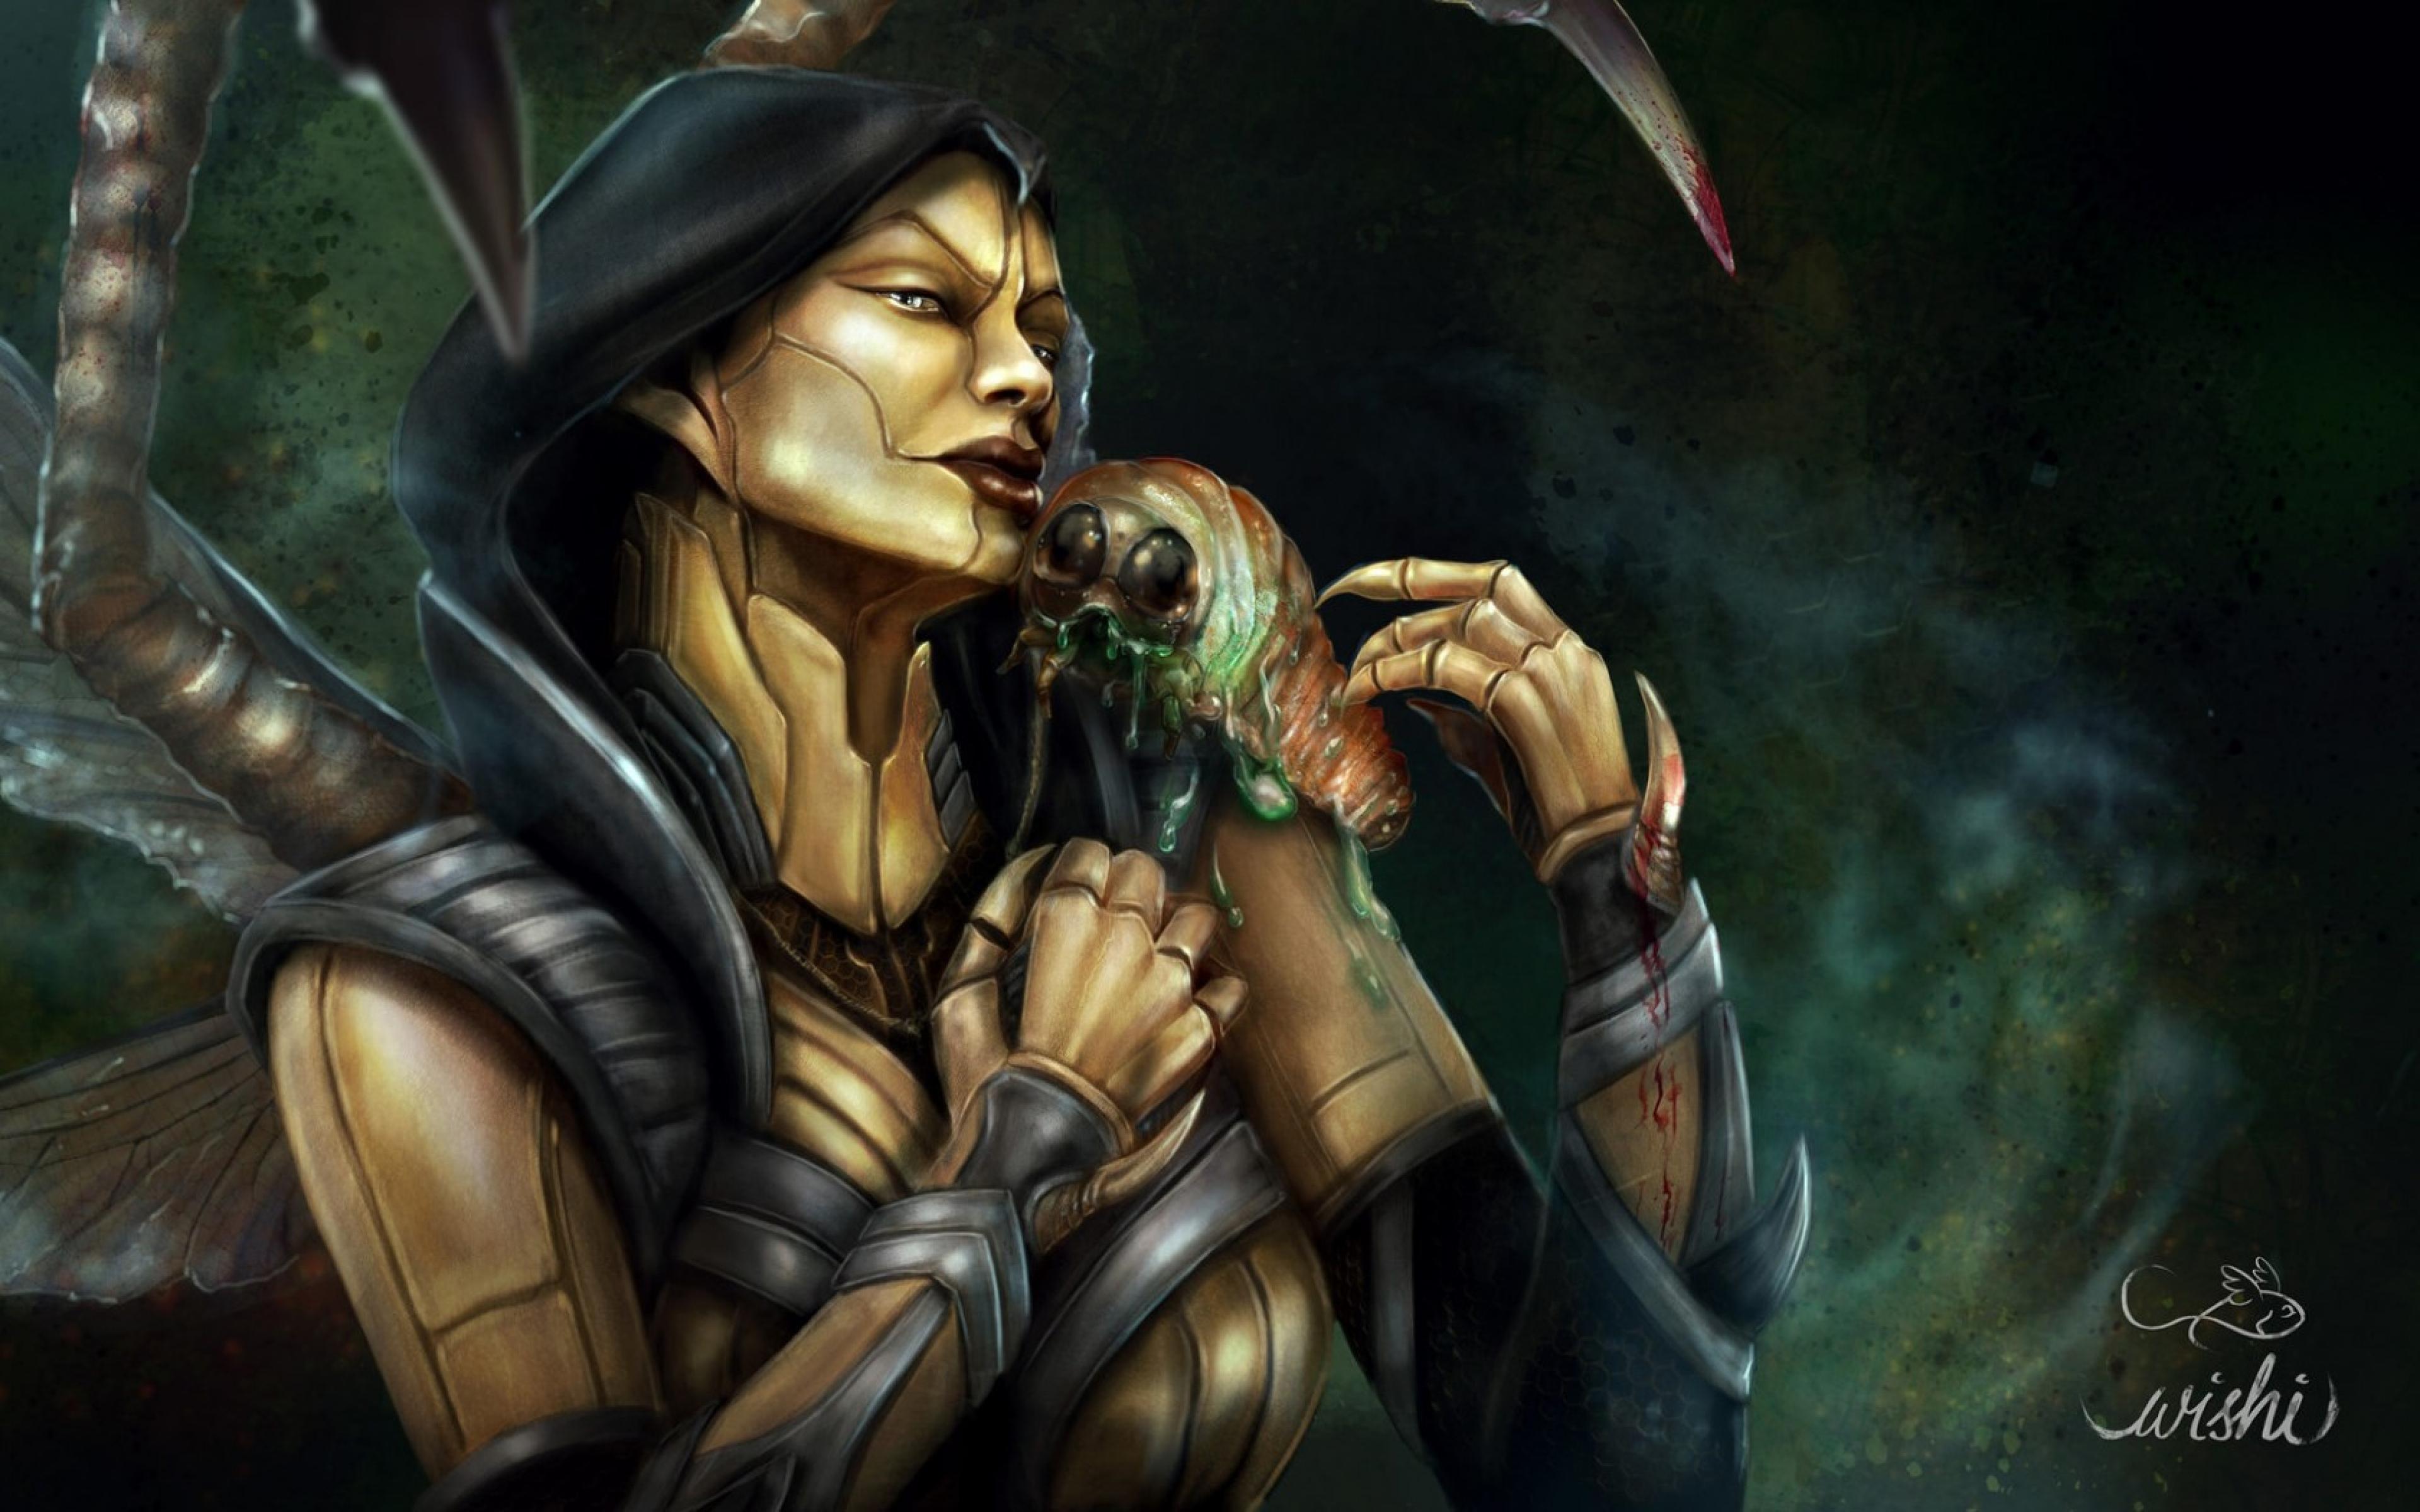 Scorpion Mortal Kombat X Wallpaper Posted By Samantha Tremblay